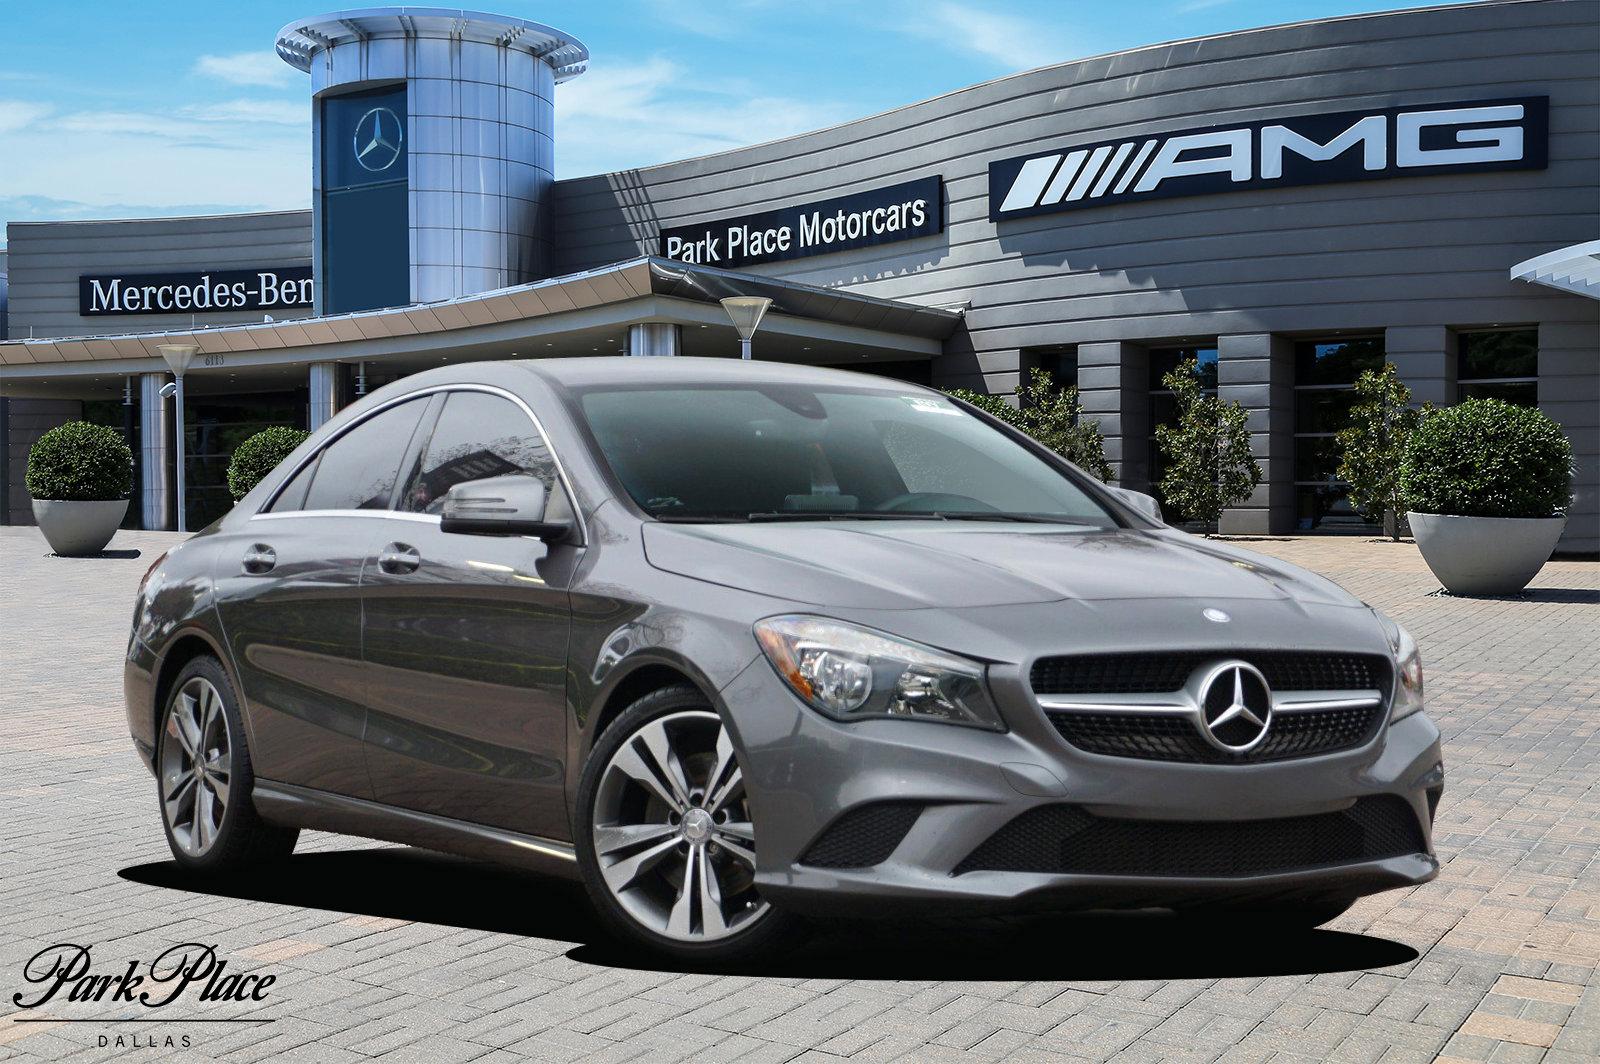 2016 Mercedes-Benz CLA 250 4MATIC image